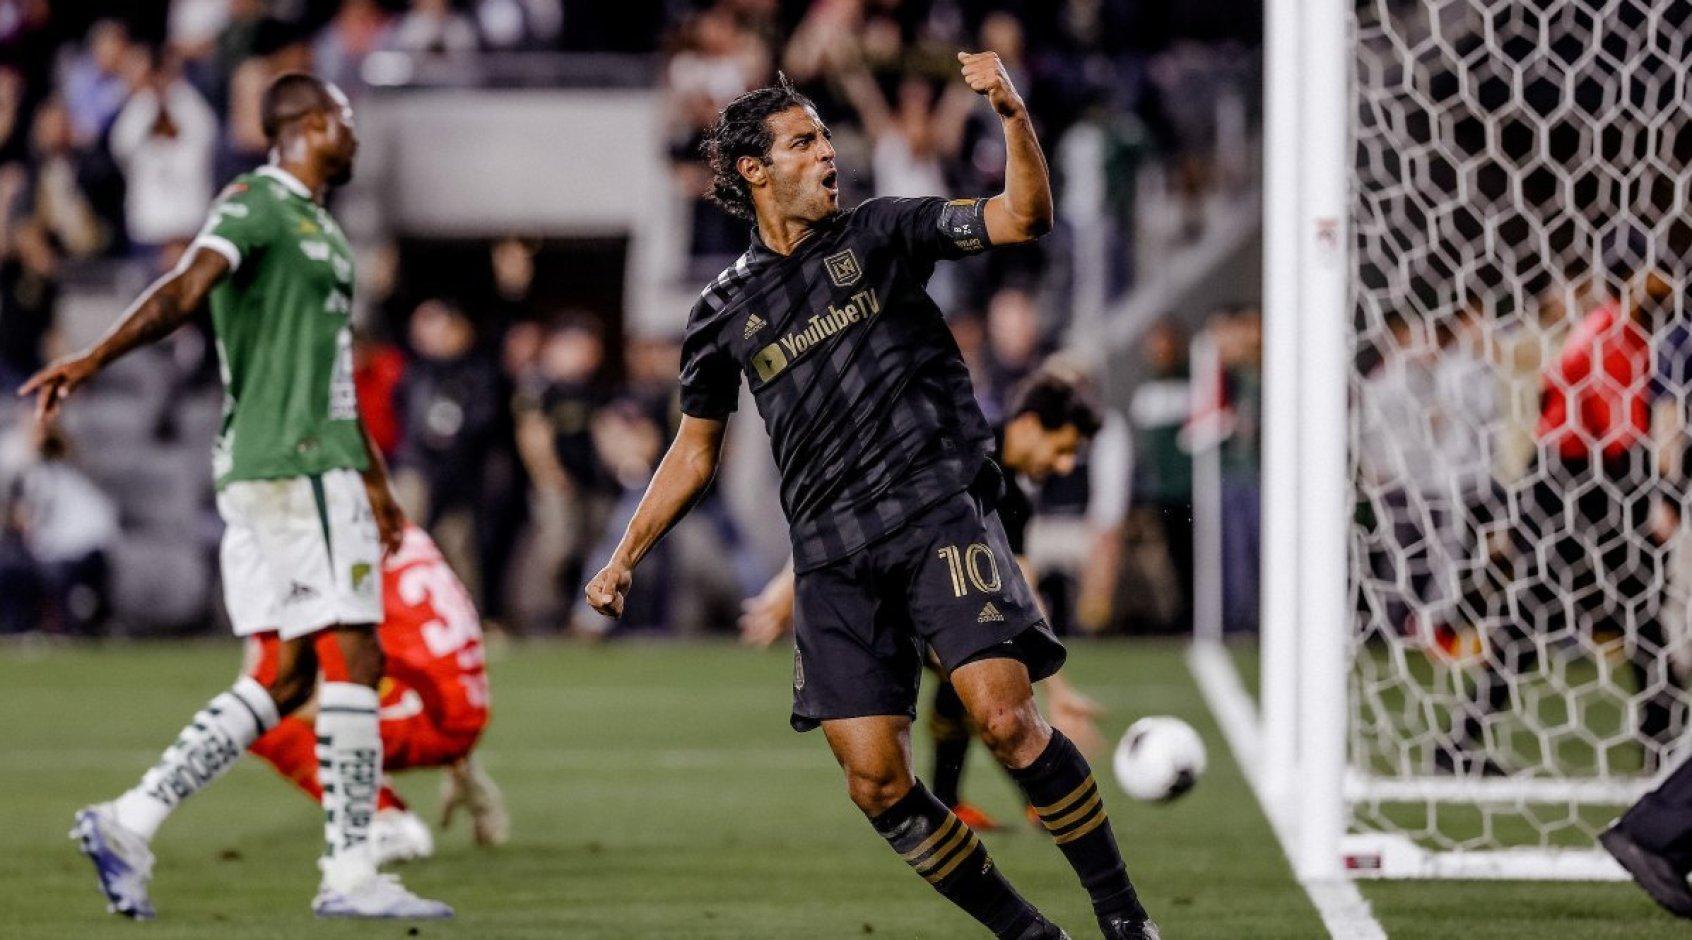 Вела, Мартинес, Посуэло, Росси - EA огласила команду сезона FIFA 20 в США